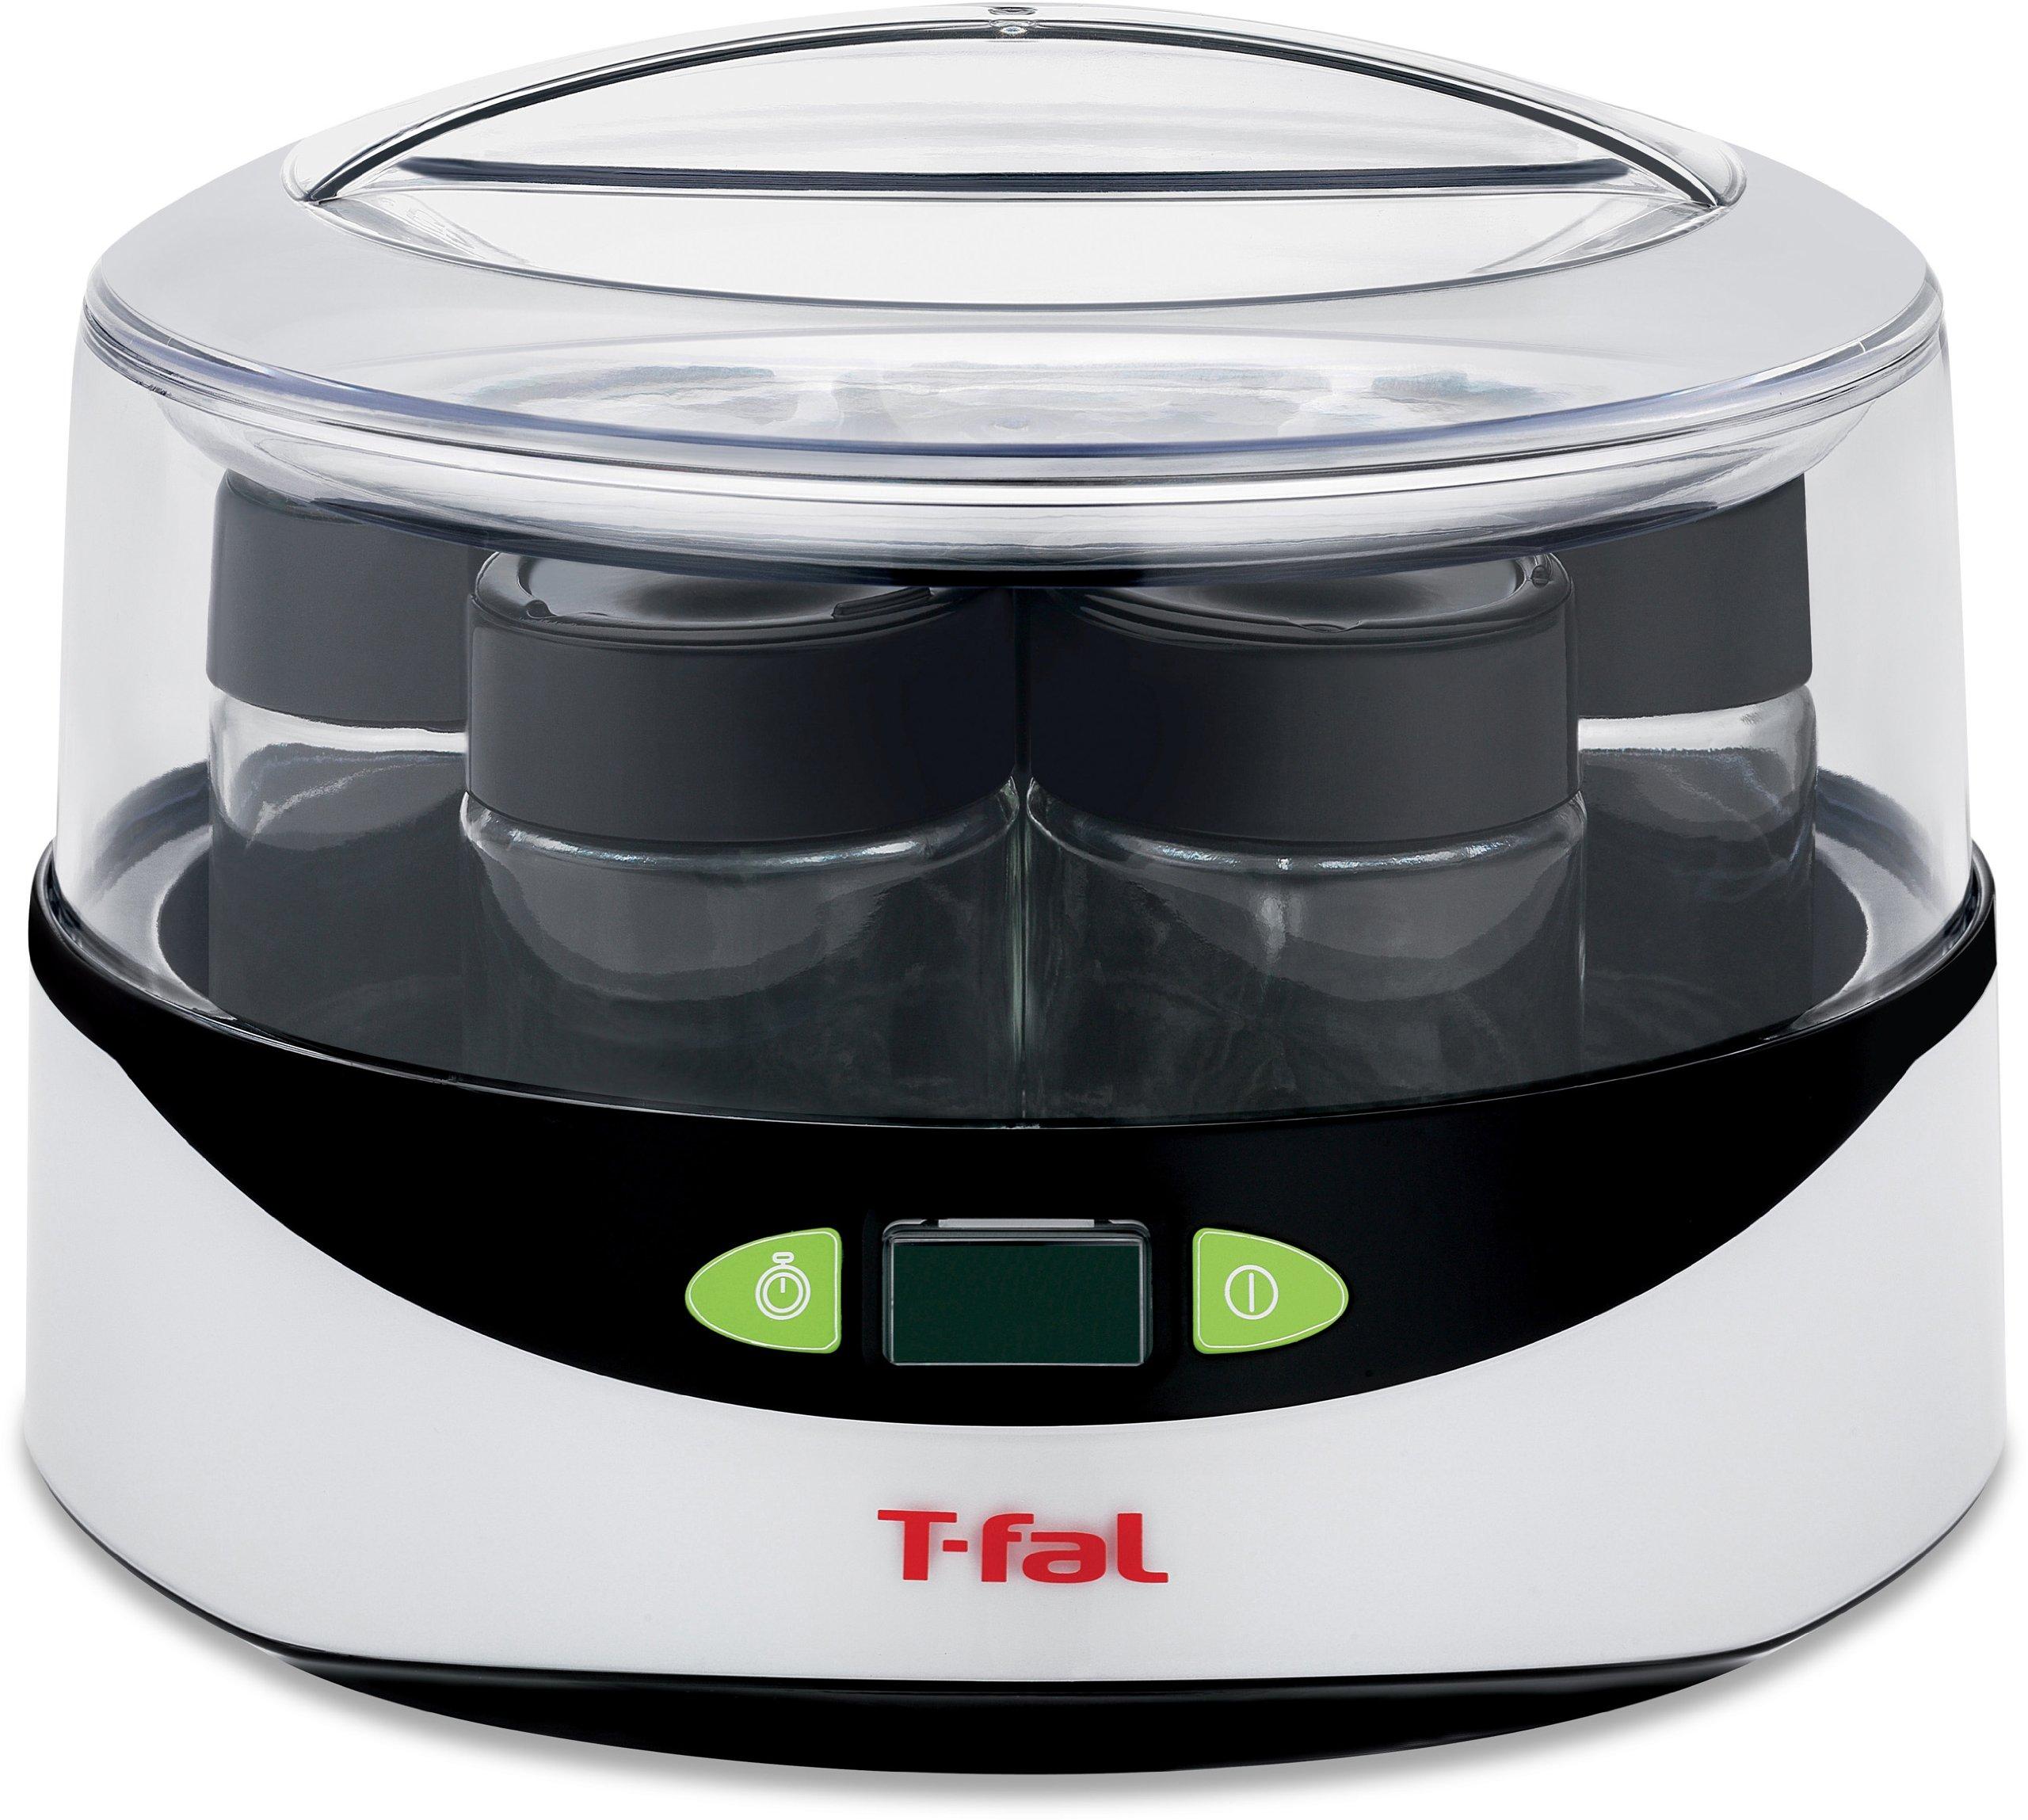 T-fal YG232 Balanced Living Yogurt Maker with LCD Timer, White by T-fal